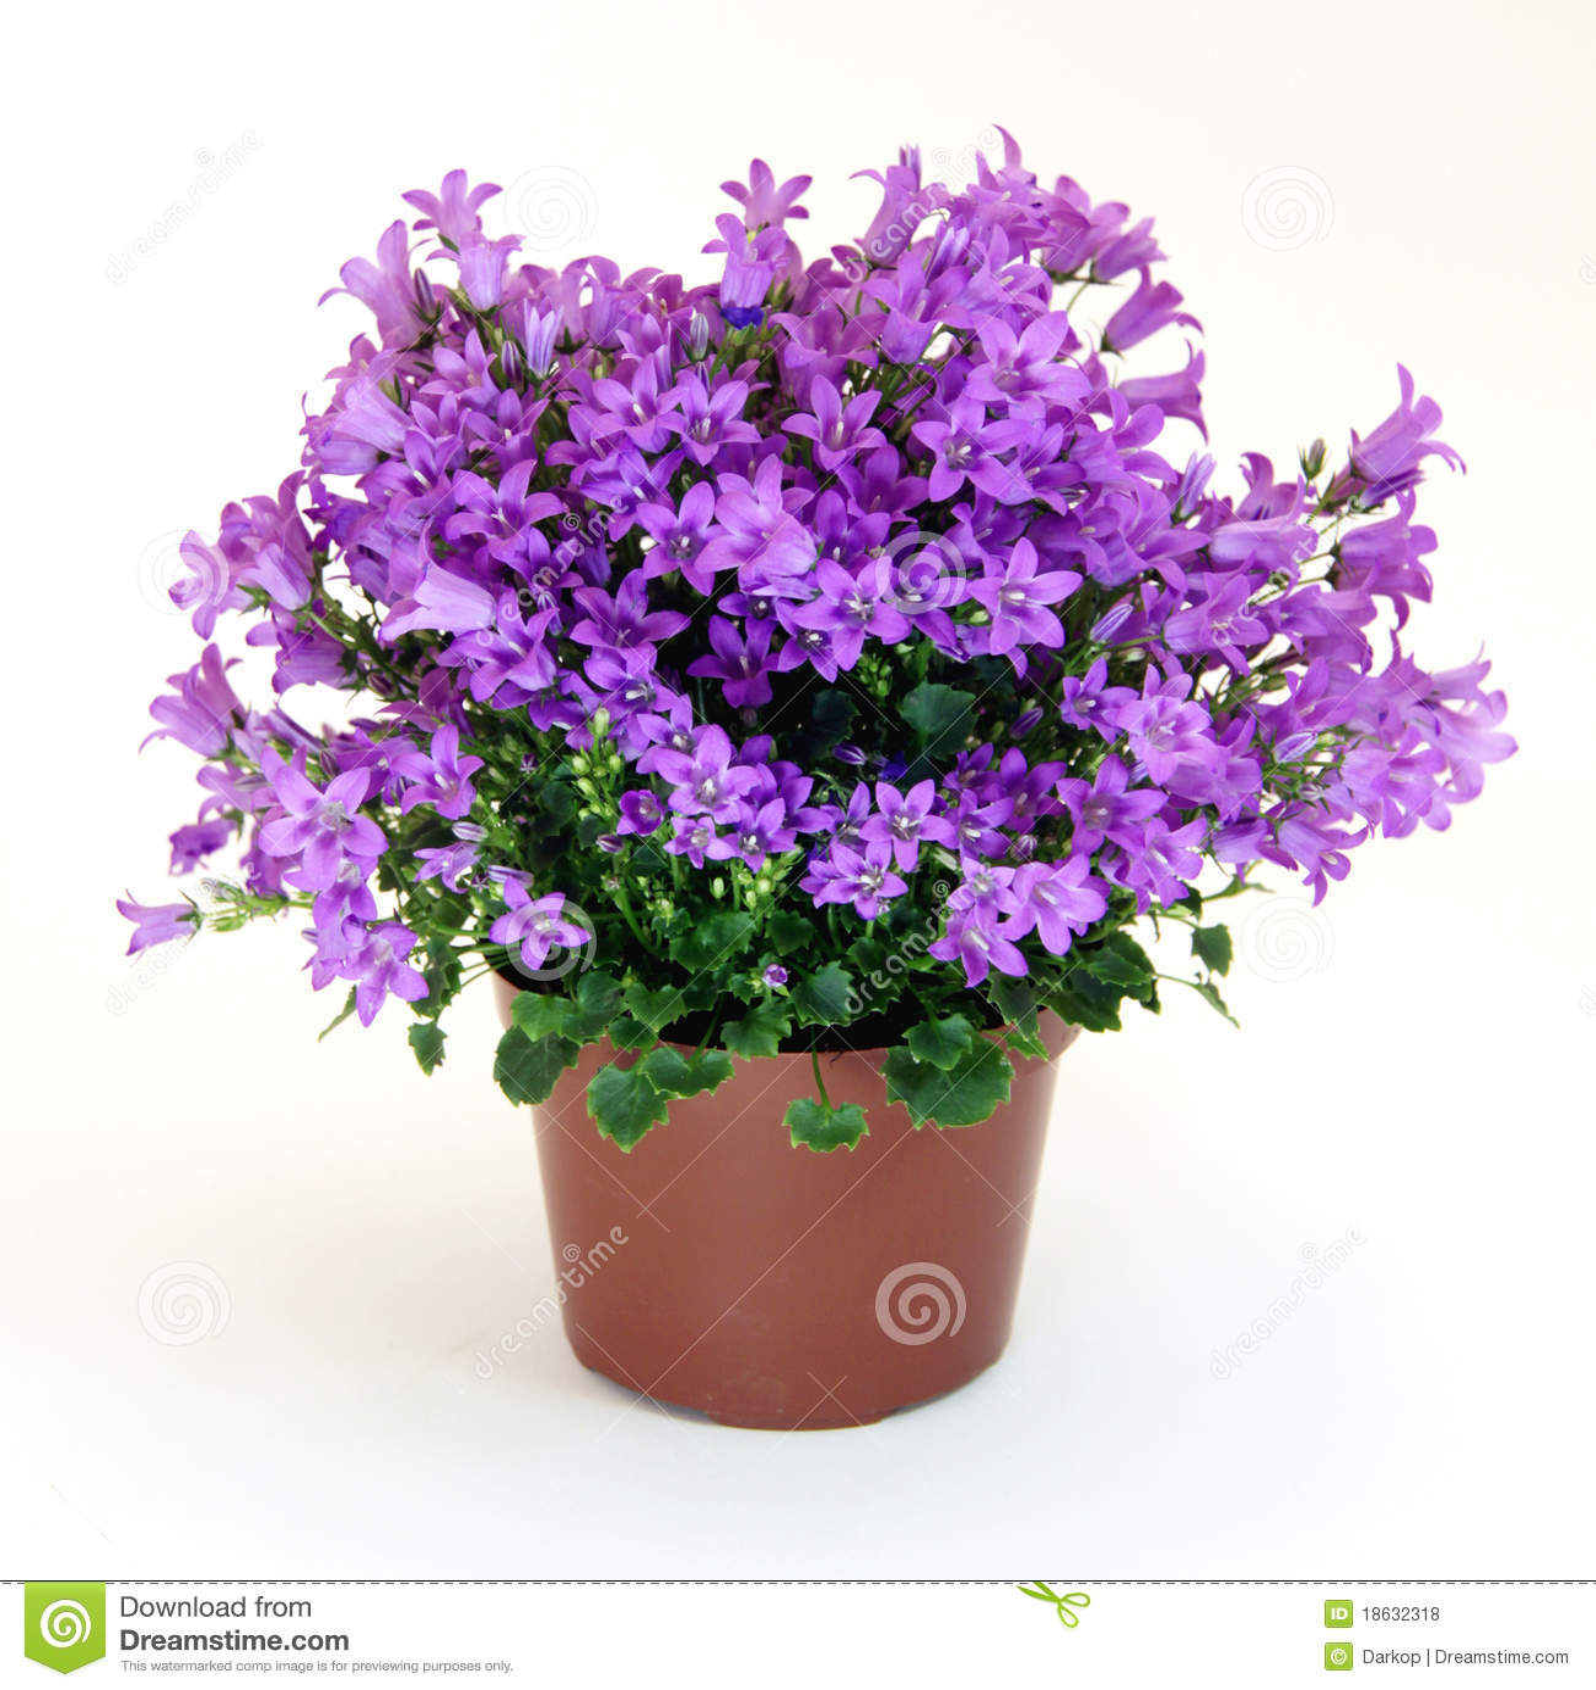 Pianta Fiori Viola.Campanula Plant Stock Photo Image Of Time Horticulture 18632318